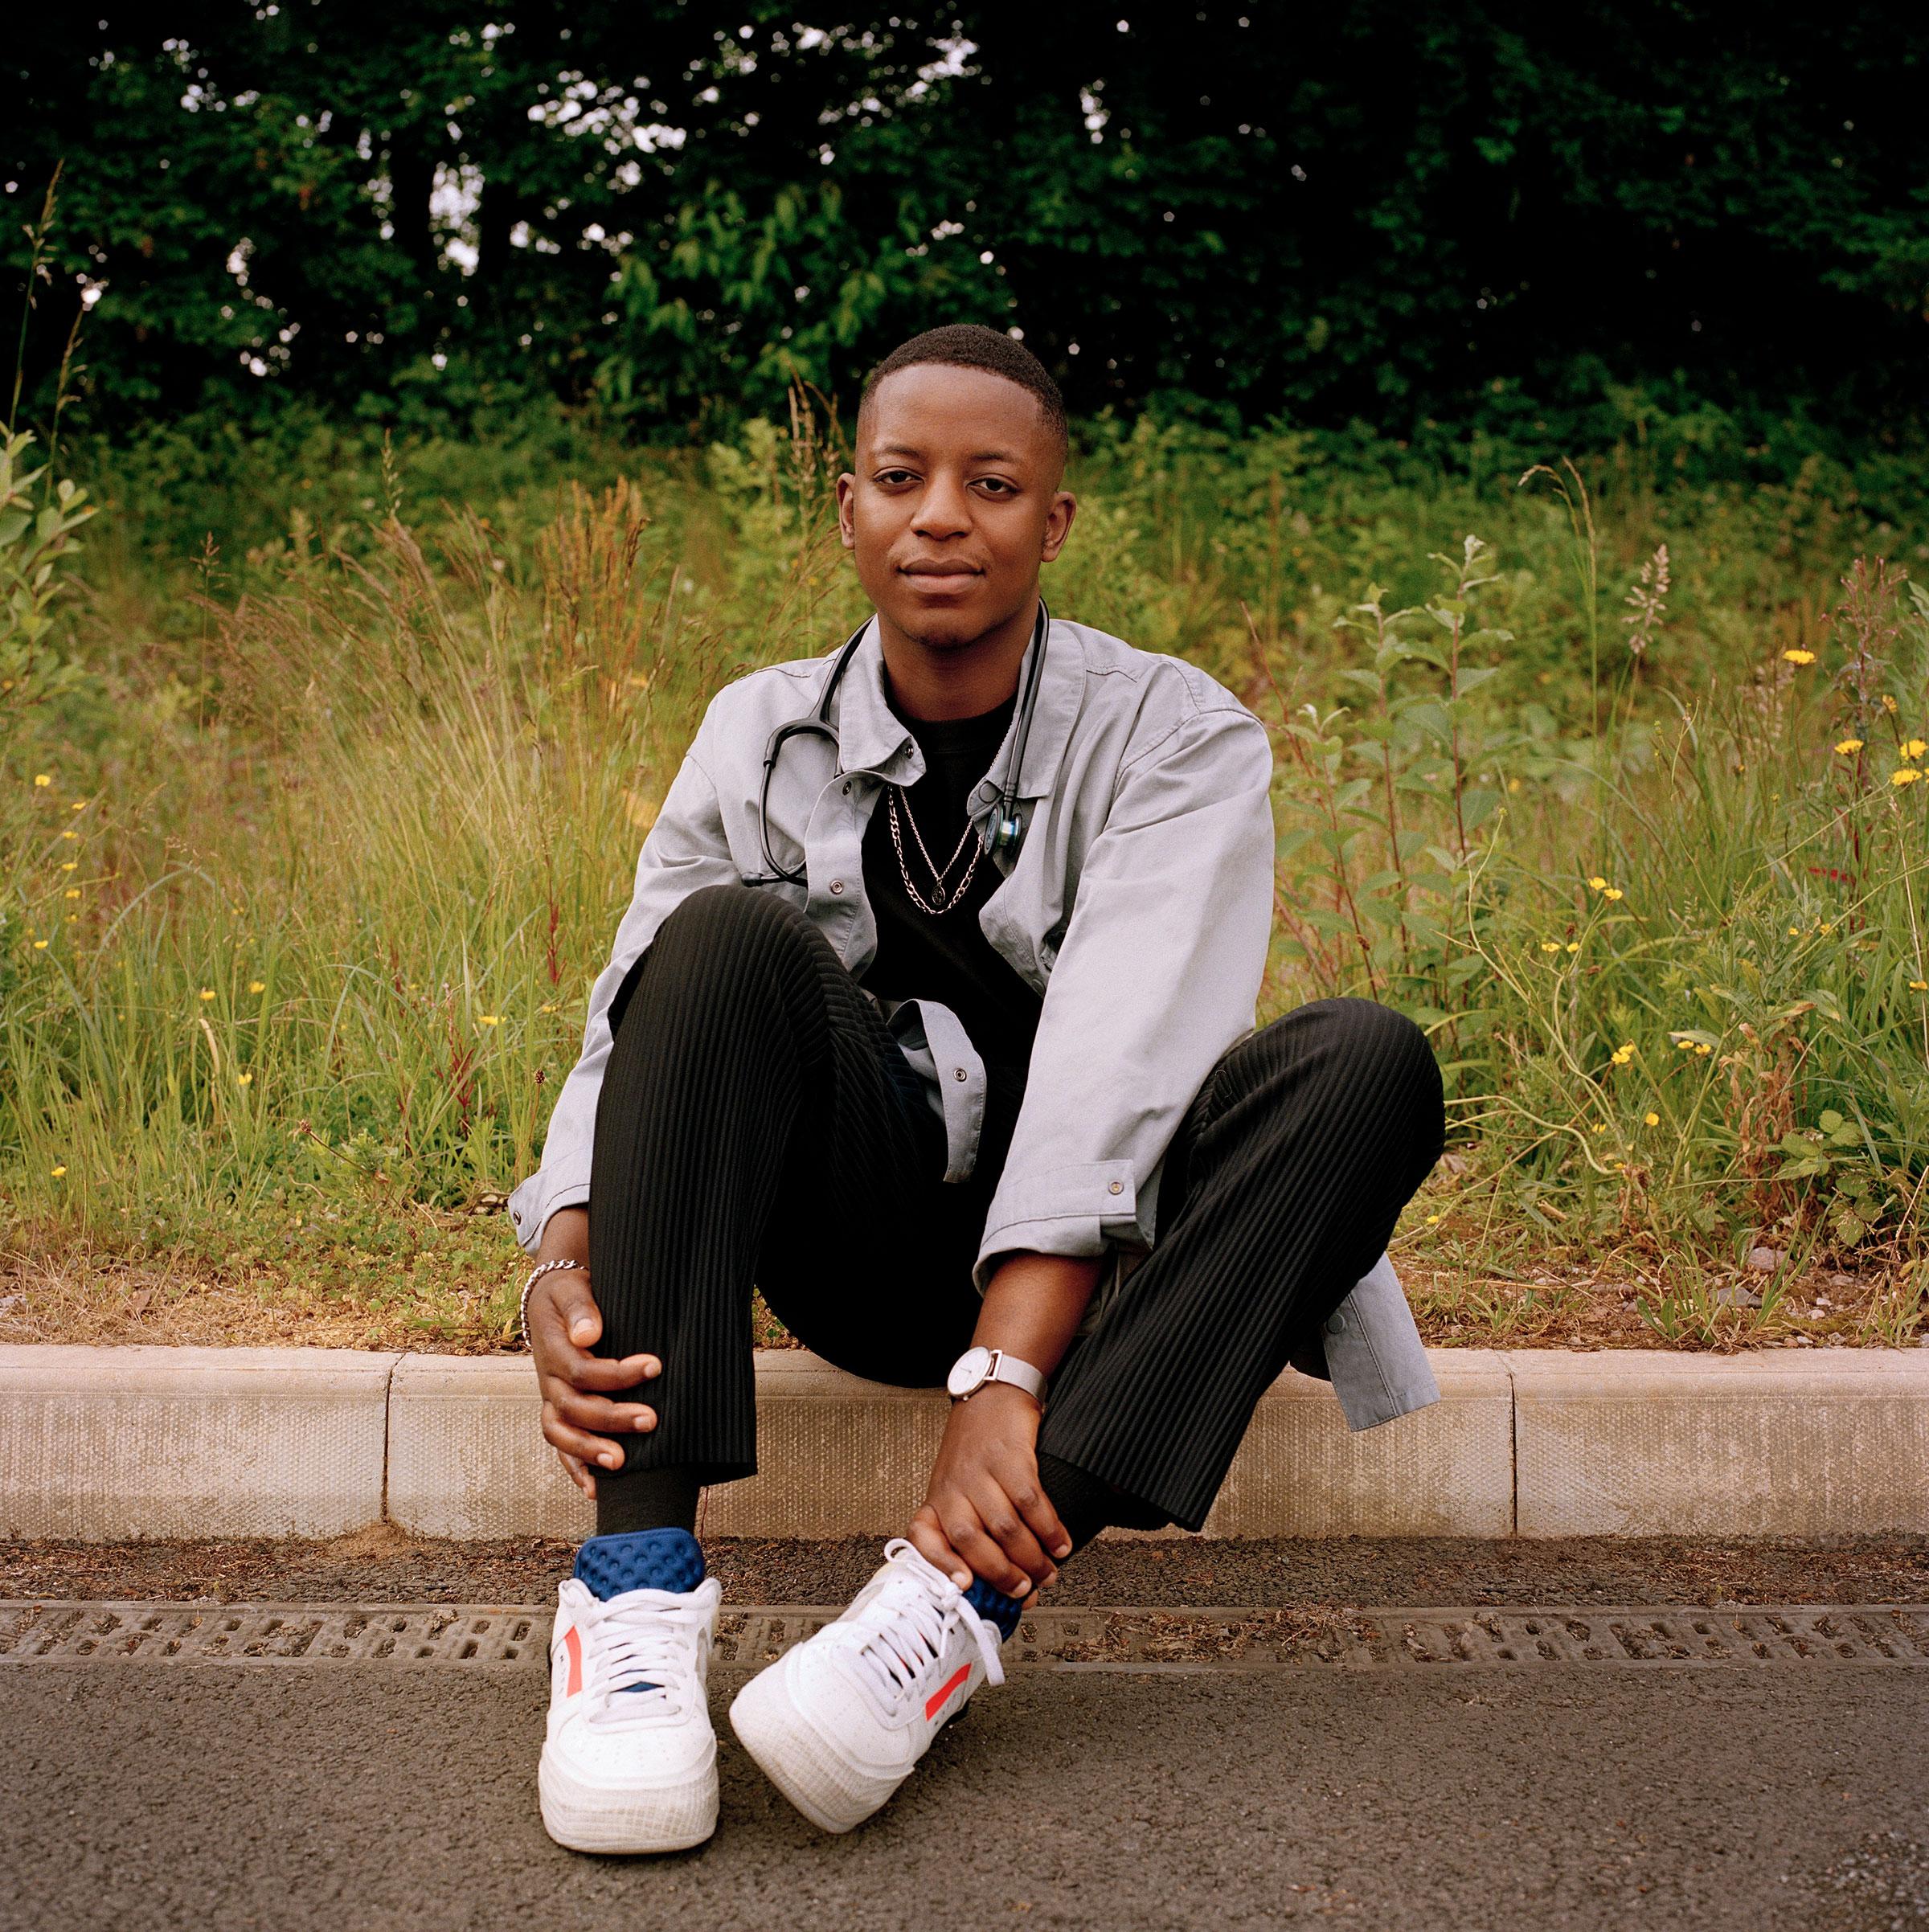 Malone Mukwende in Birmingham, U.K., on June 19, 2021.